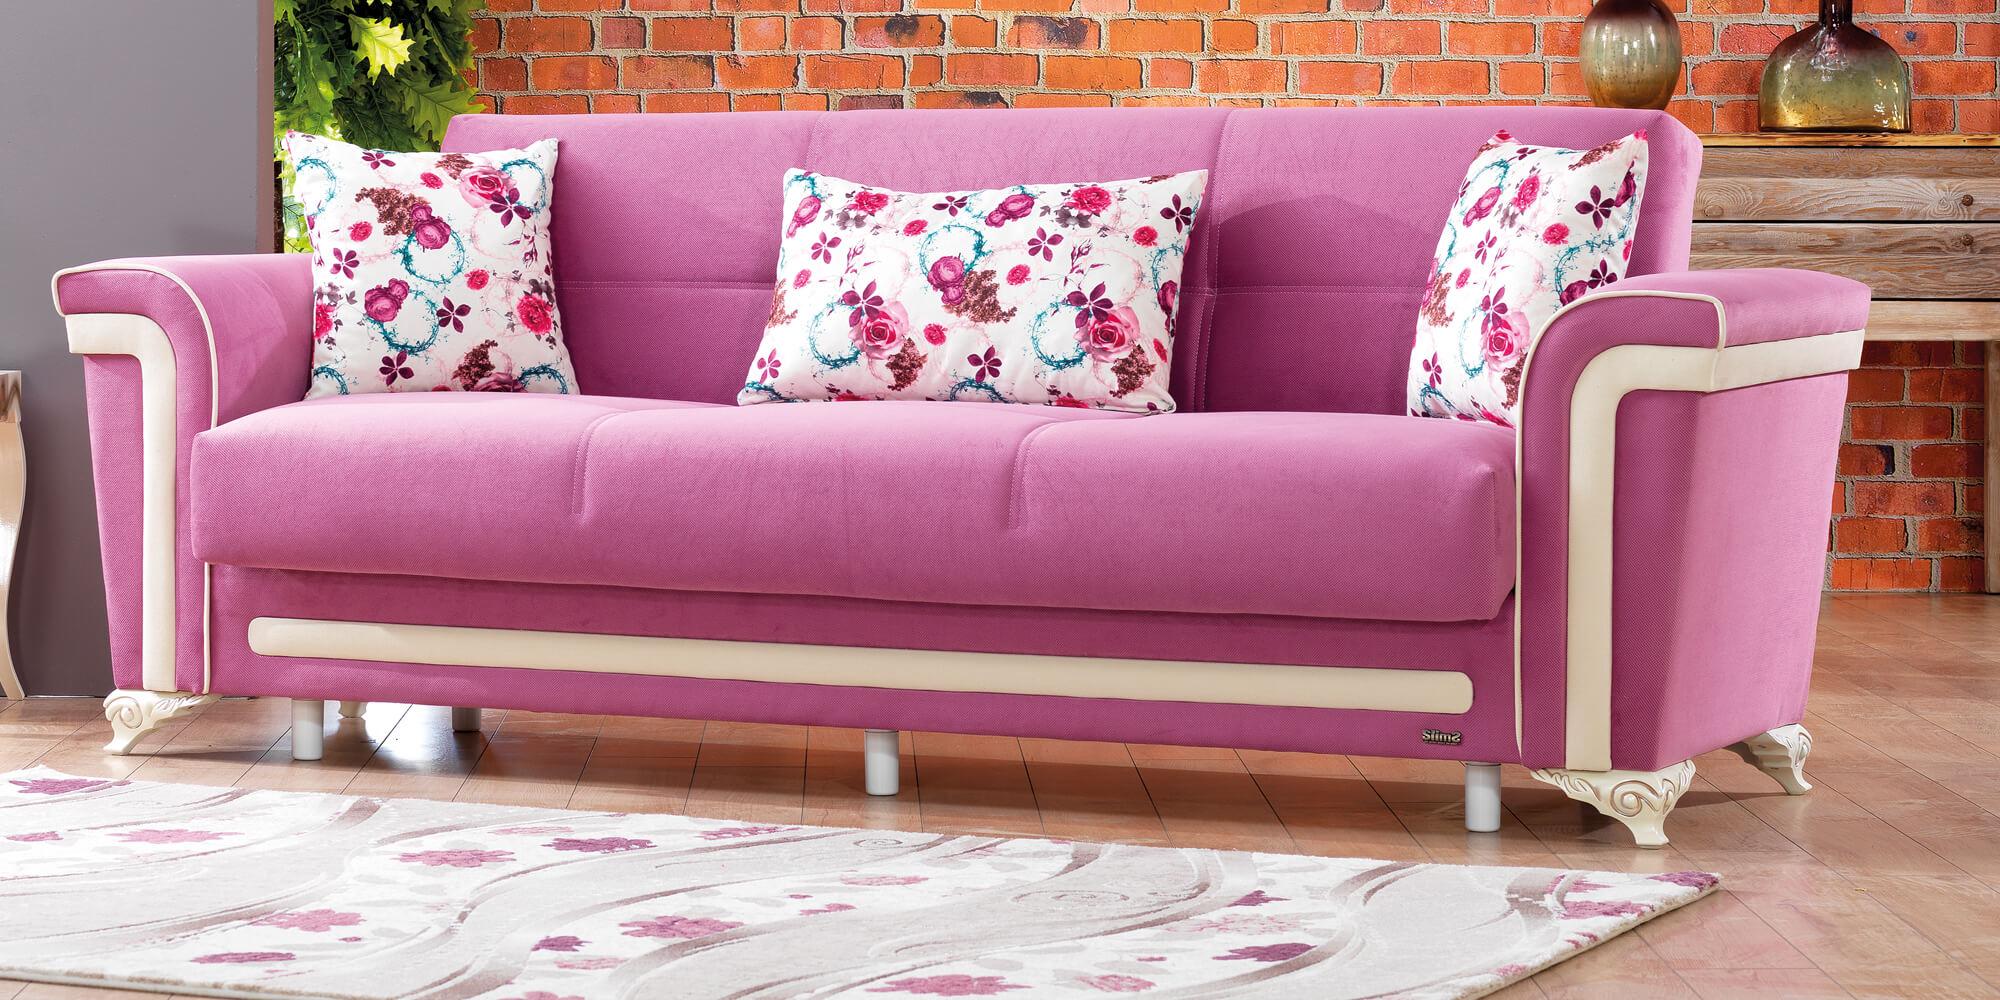 alya 3 2 1 maxi sofa set yuvam m belhaus in wuppertal cilek offizieller h ndler in europa. Black Bedroom Furniture Sets. Home Design Ideas